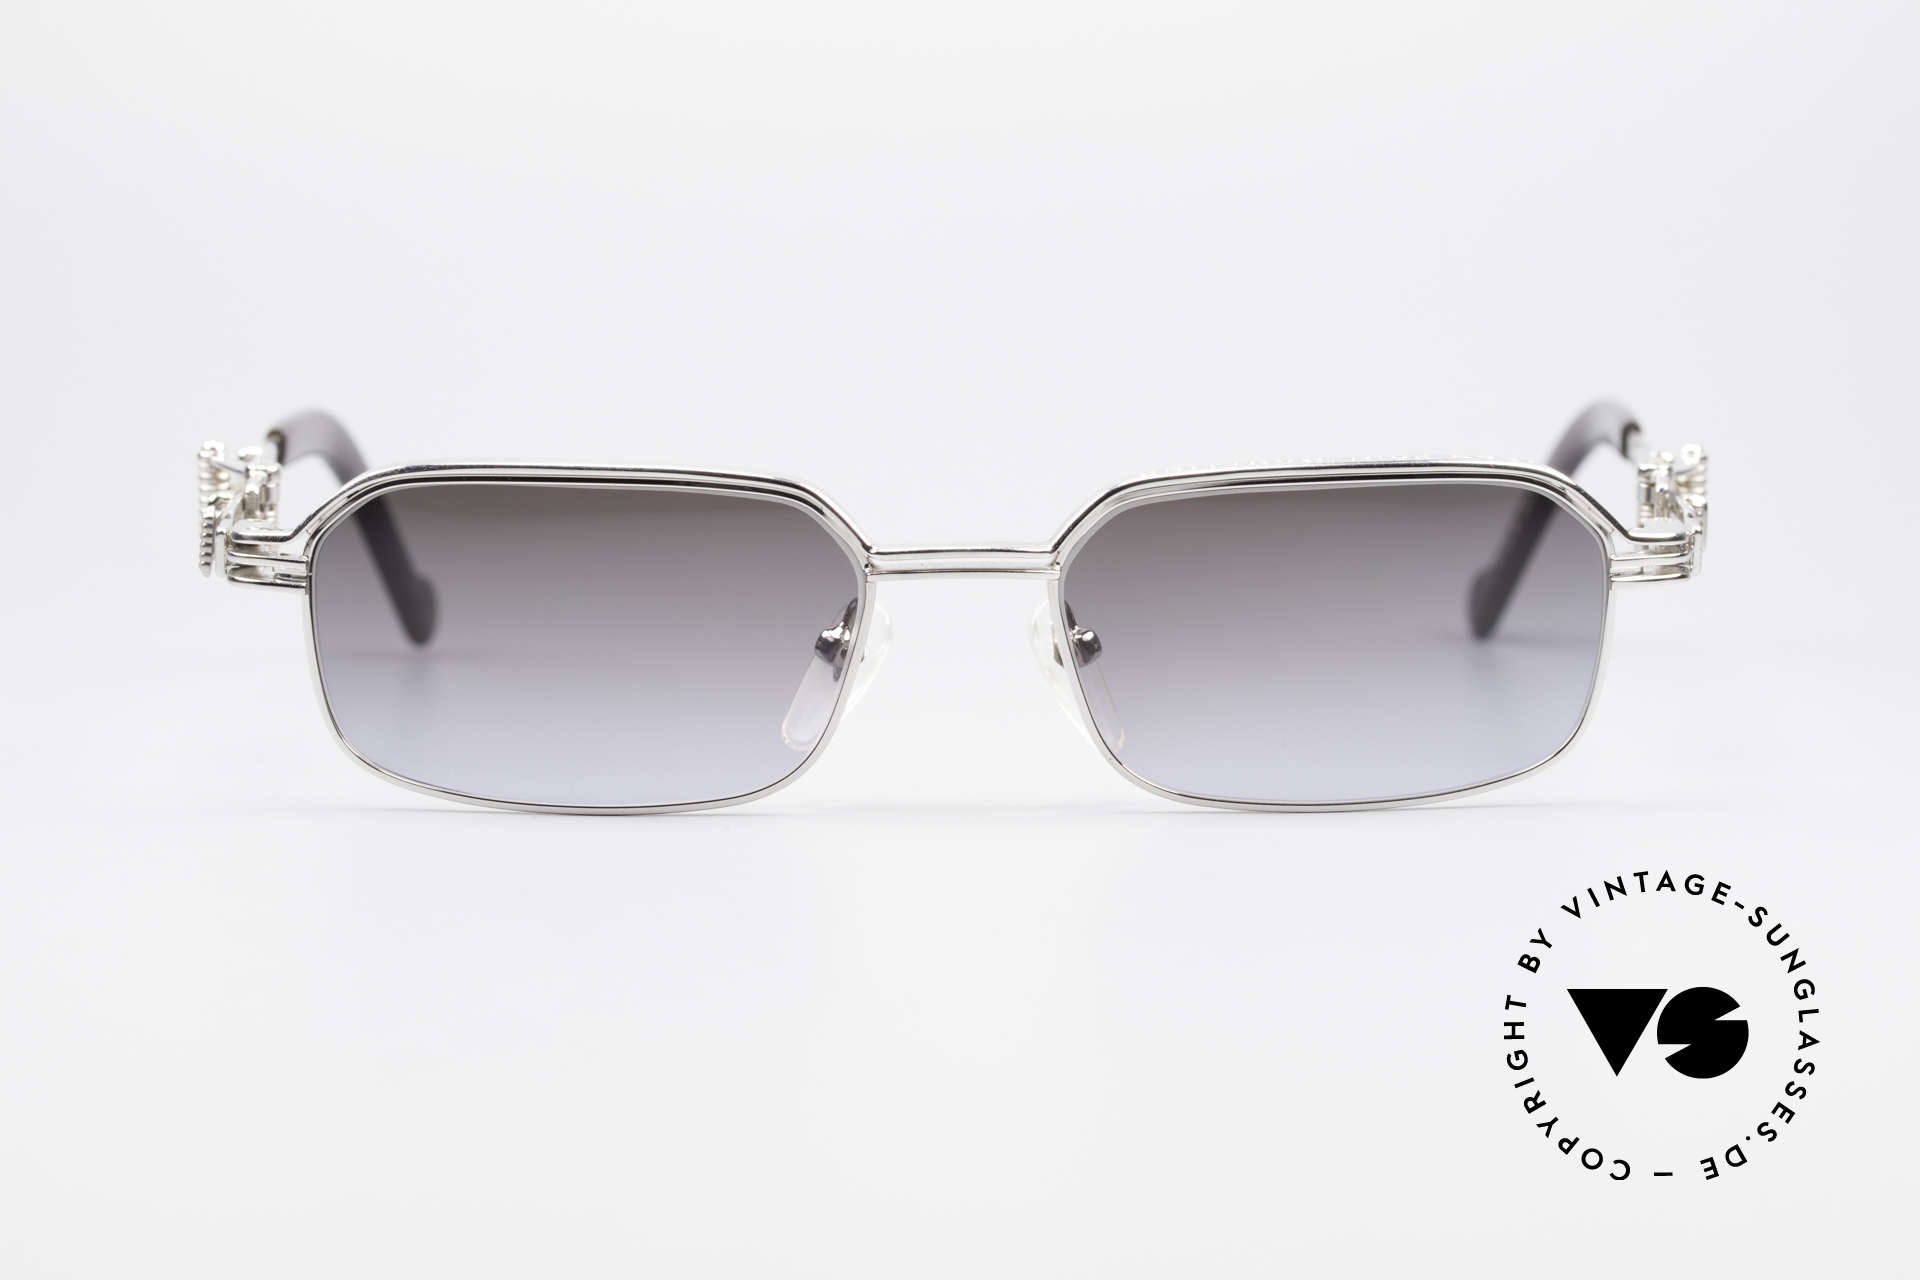 Jean Paul Gaultier 56-0002 Belt Buckle Frame Adjustable, outstanding quality (rhodanized TITANIUM frame), Made for Men